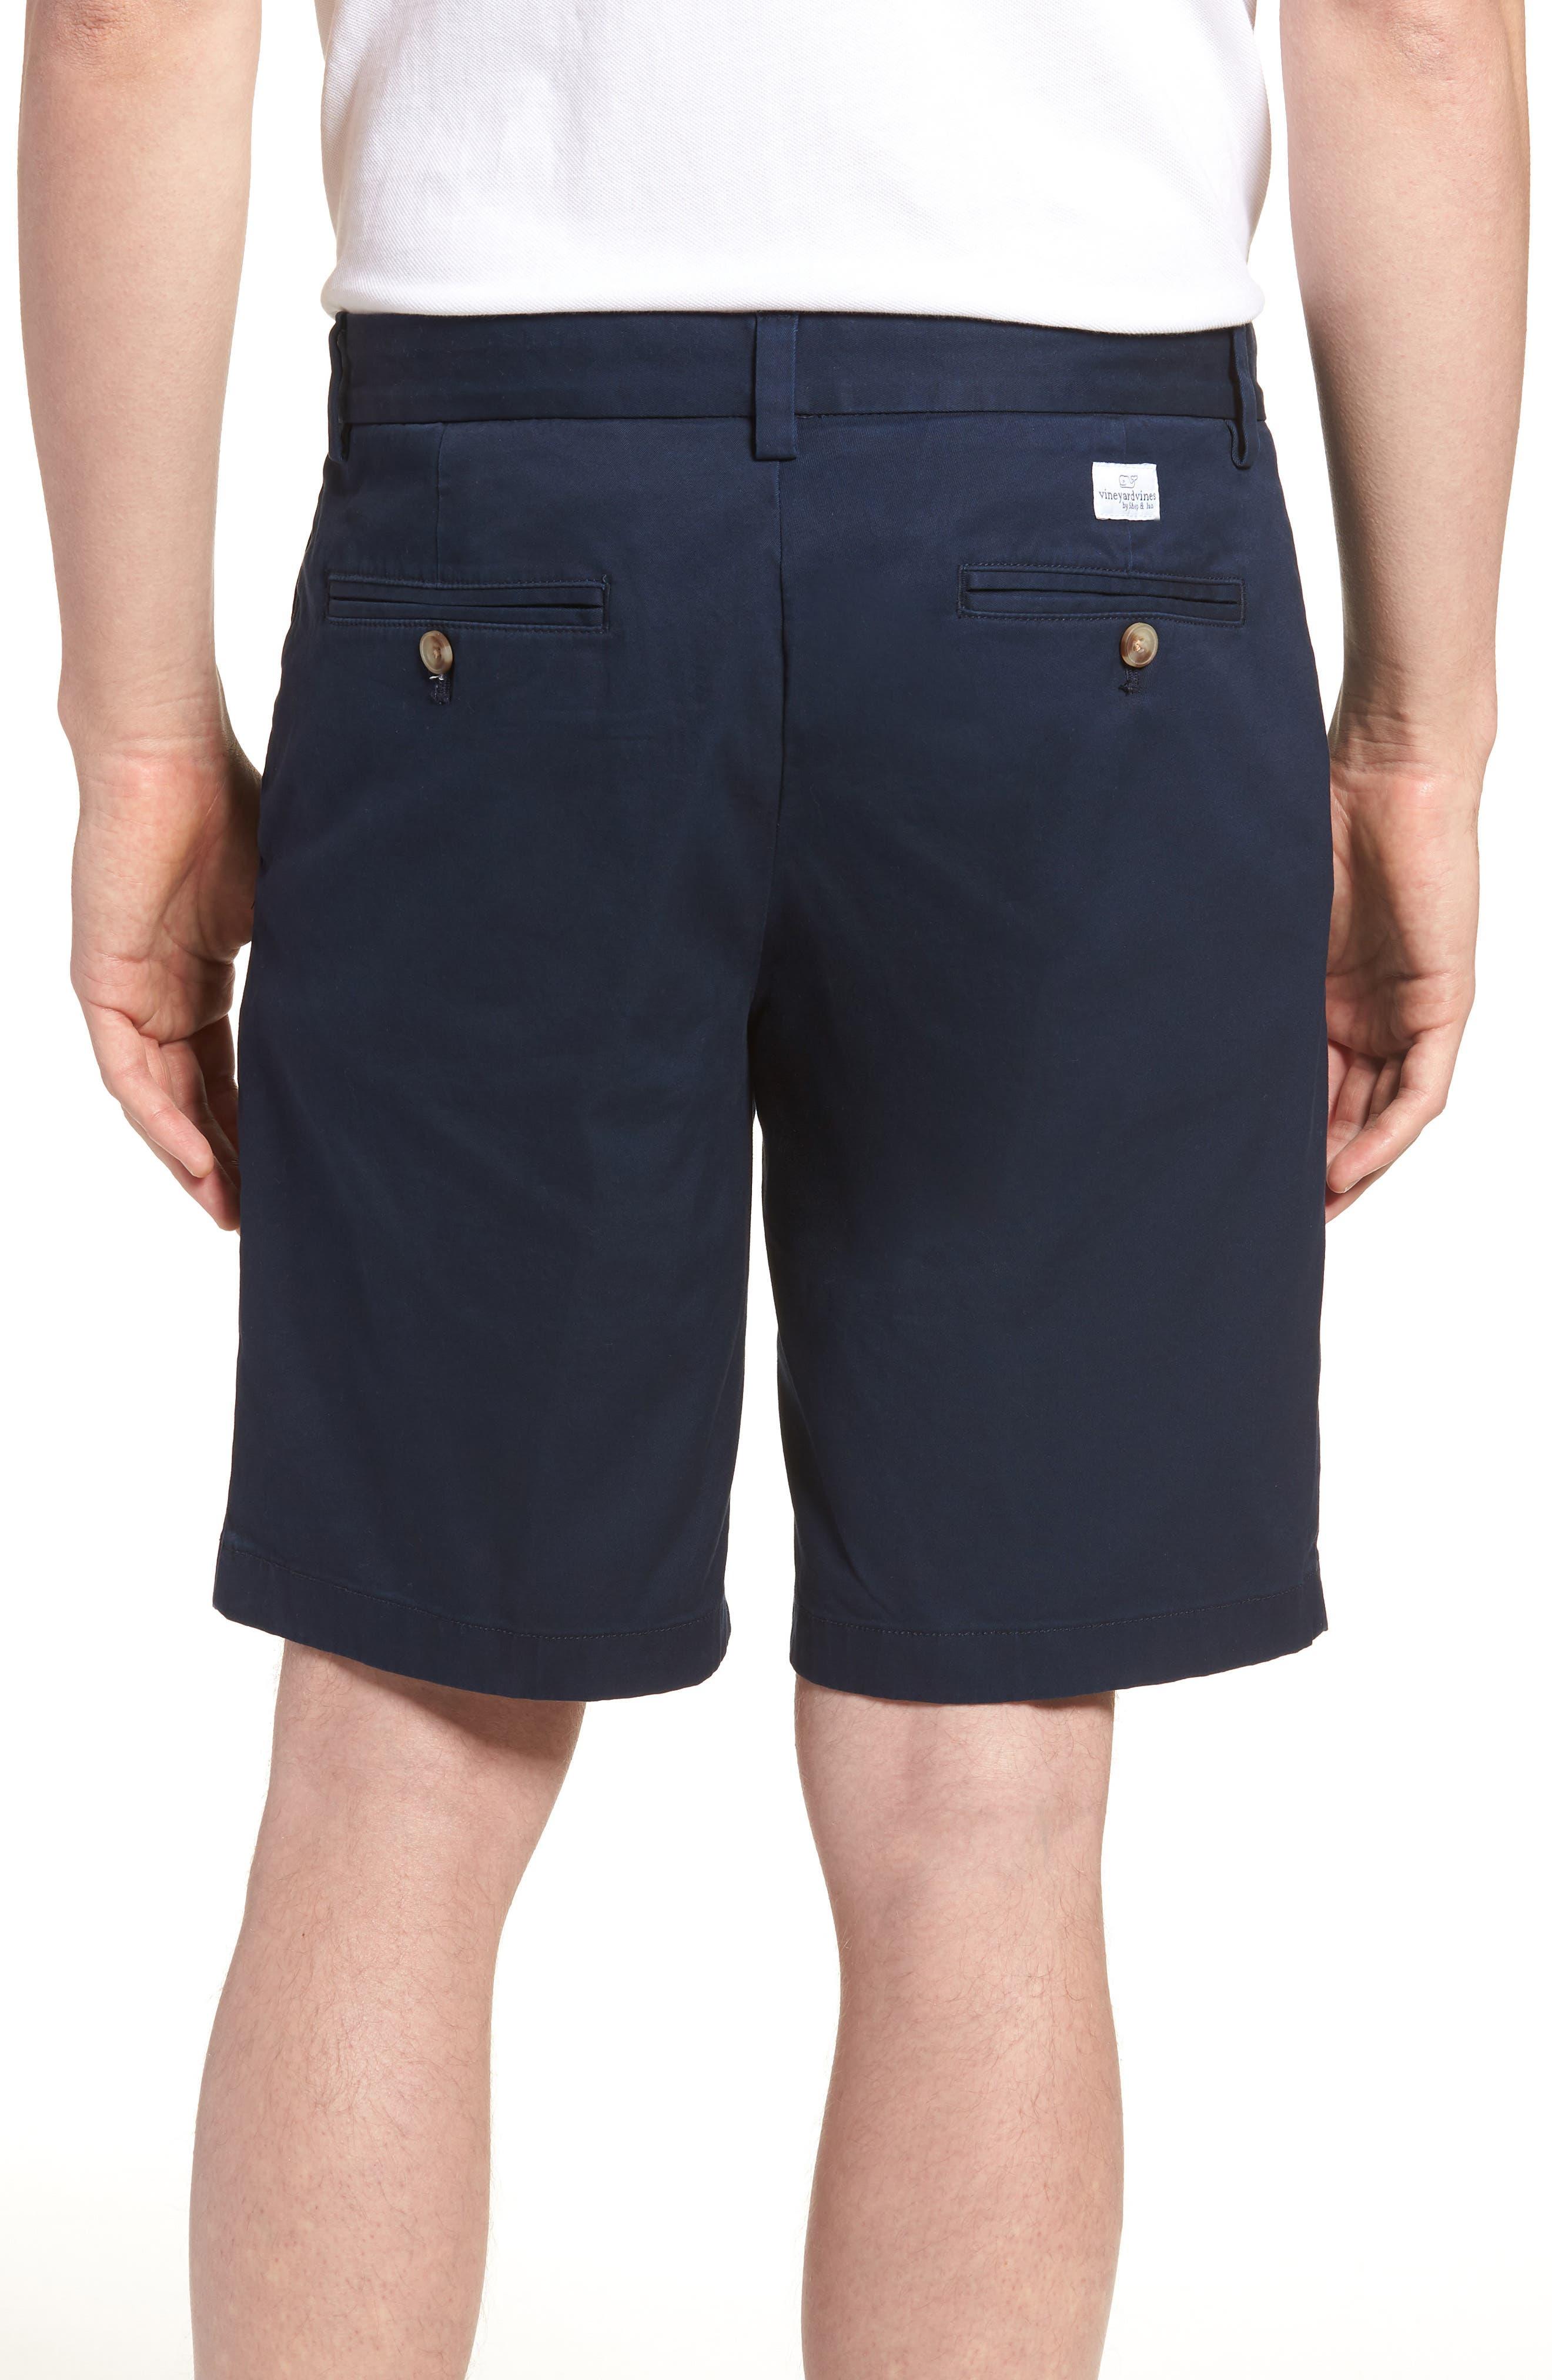 9 Inch Stretch Breaker Shorts,                             Alternate thumbnail 27, color,